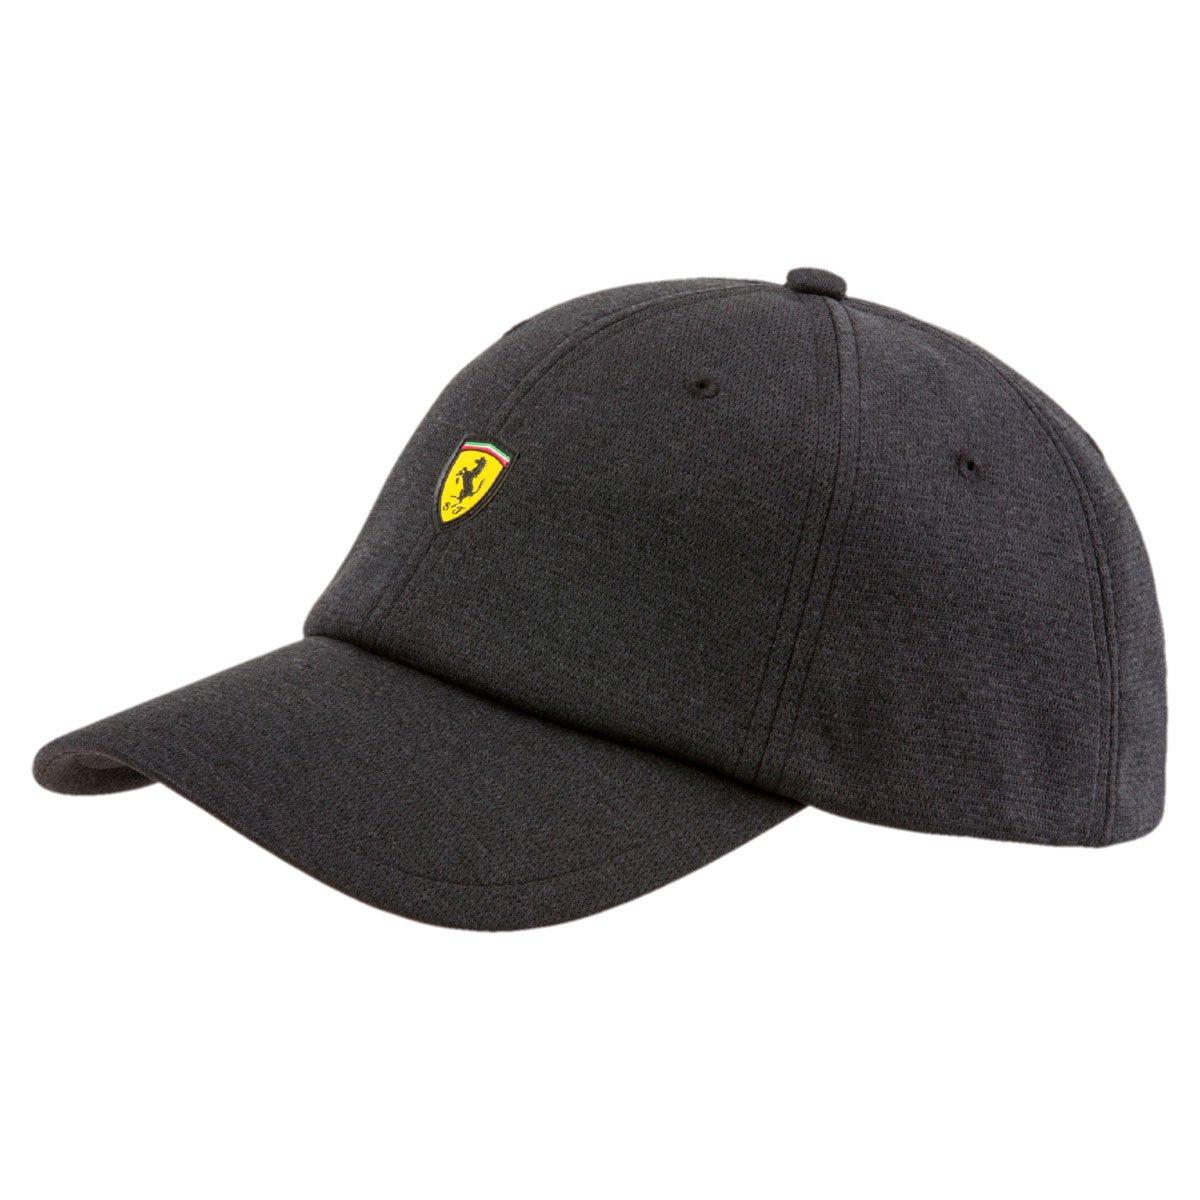 d2c1f4fc7a231 Gorra unisex Ferrari Puma